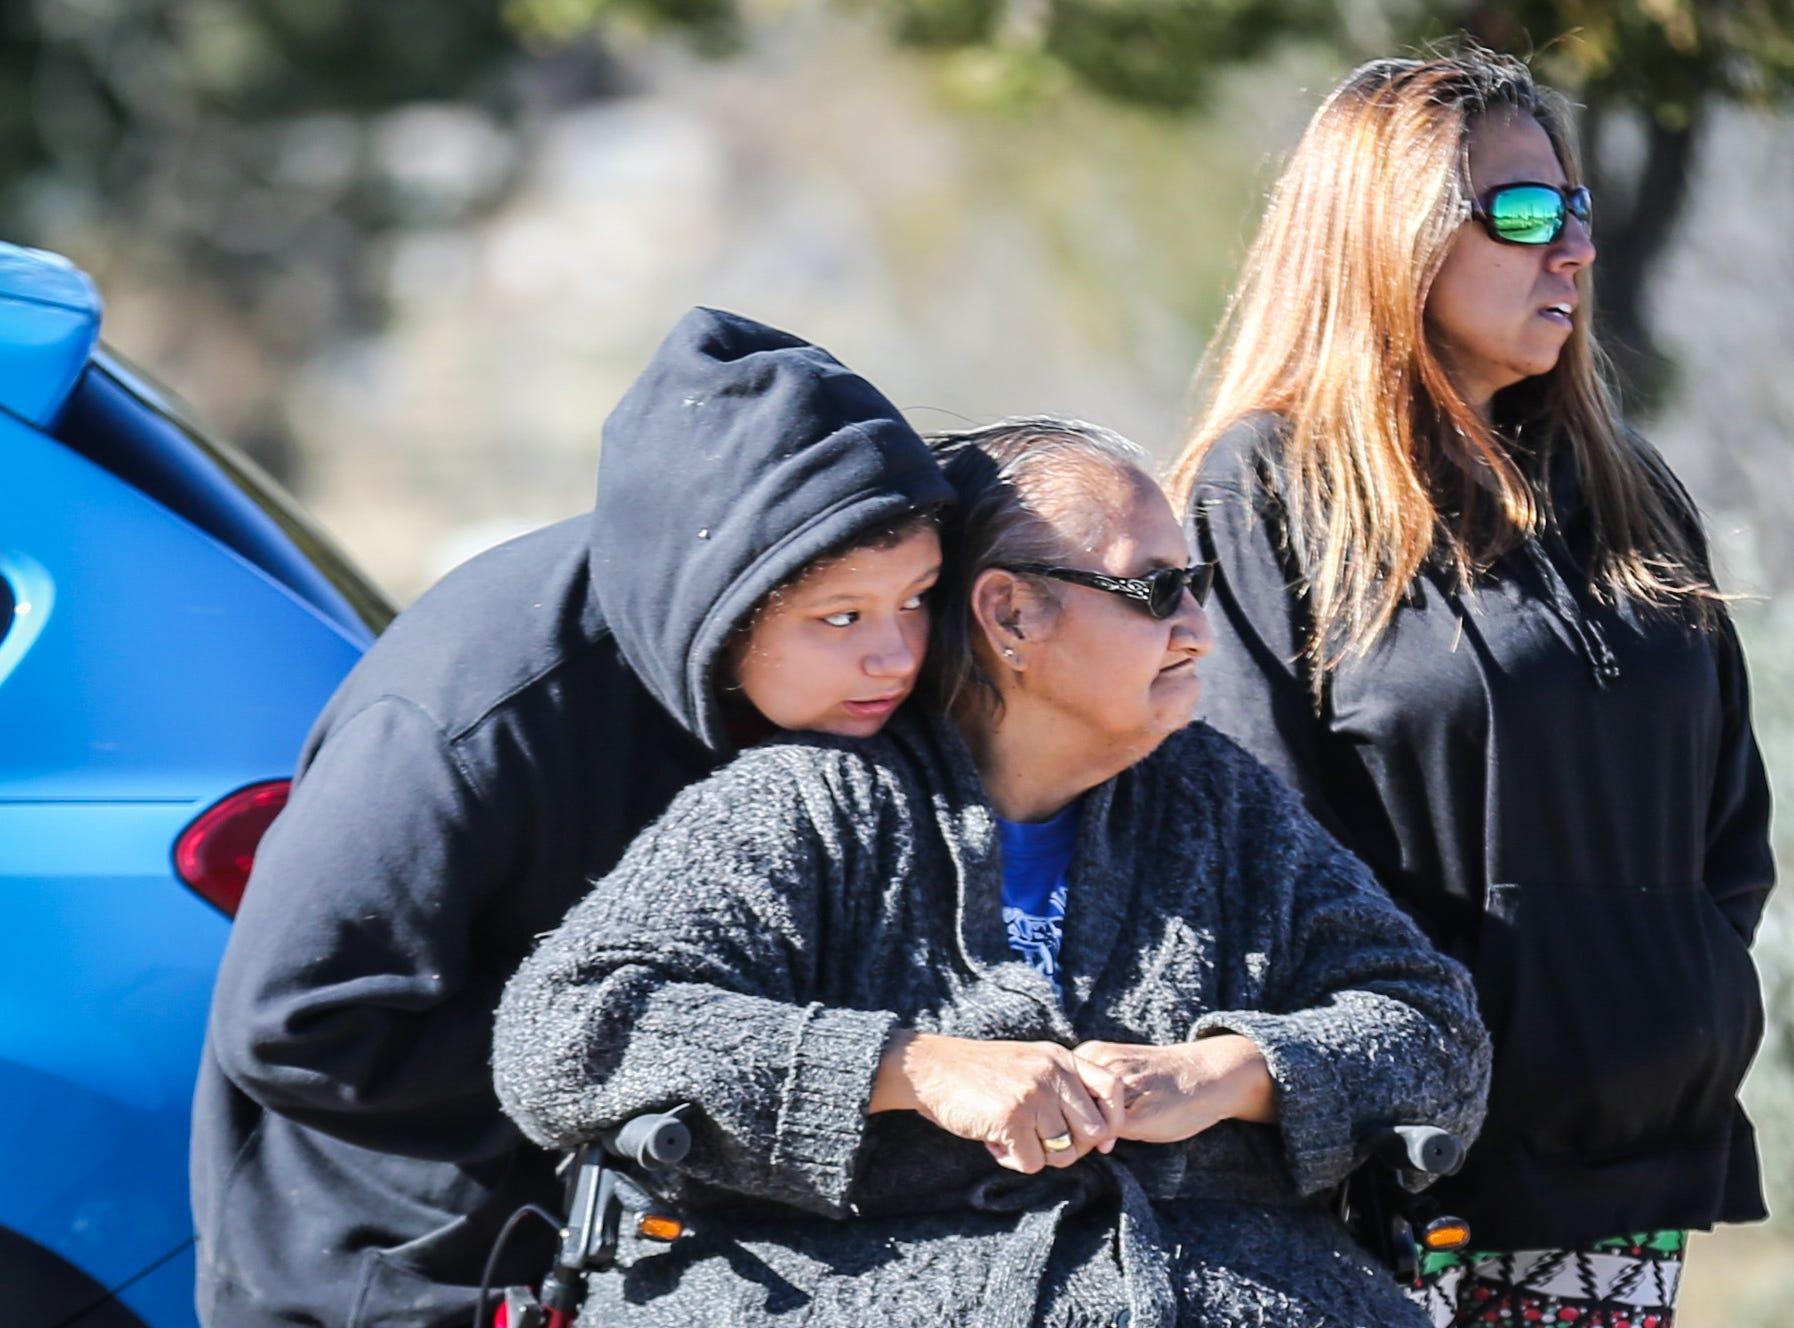 Yasmin Rodriguez, 11, leans on Elva Gonzales before the Wreaths Across America ceremony Saturday, Dec. 15, 2018, at Belvedere Memorial Park.